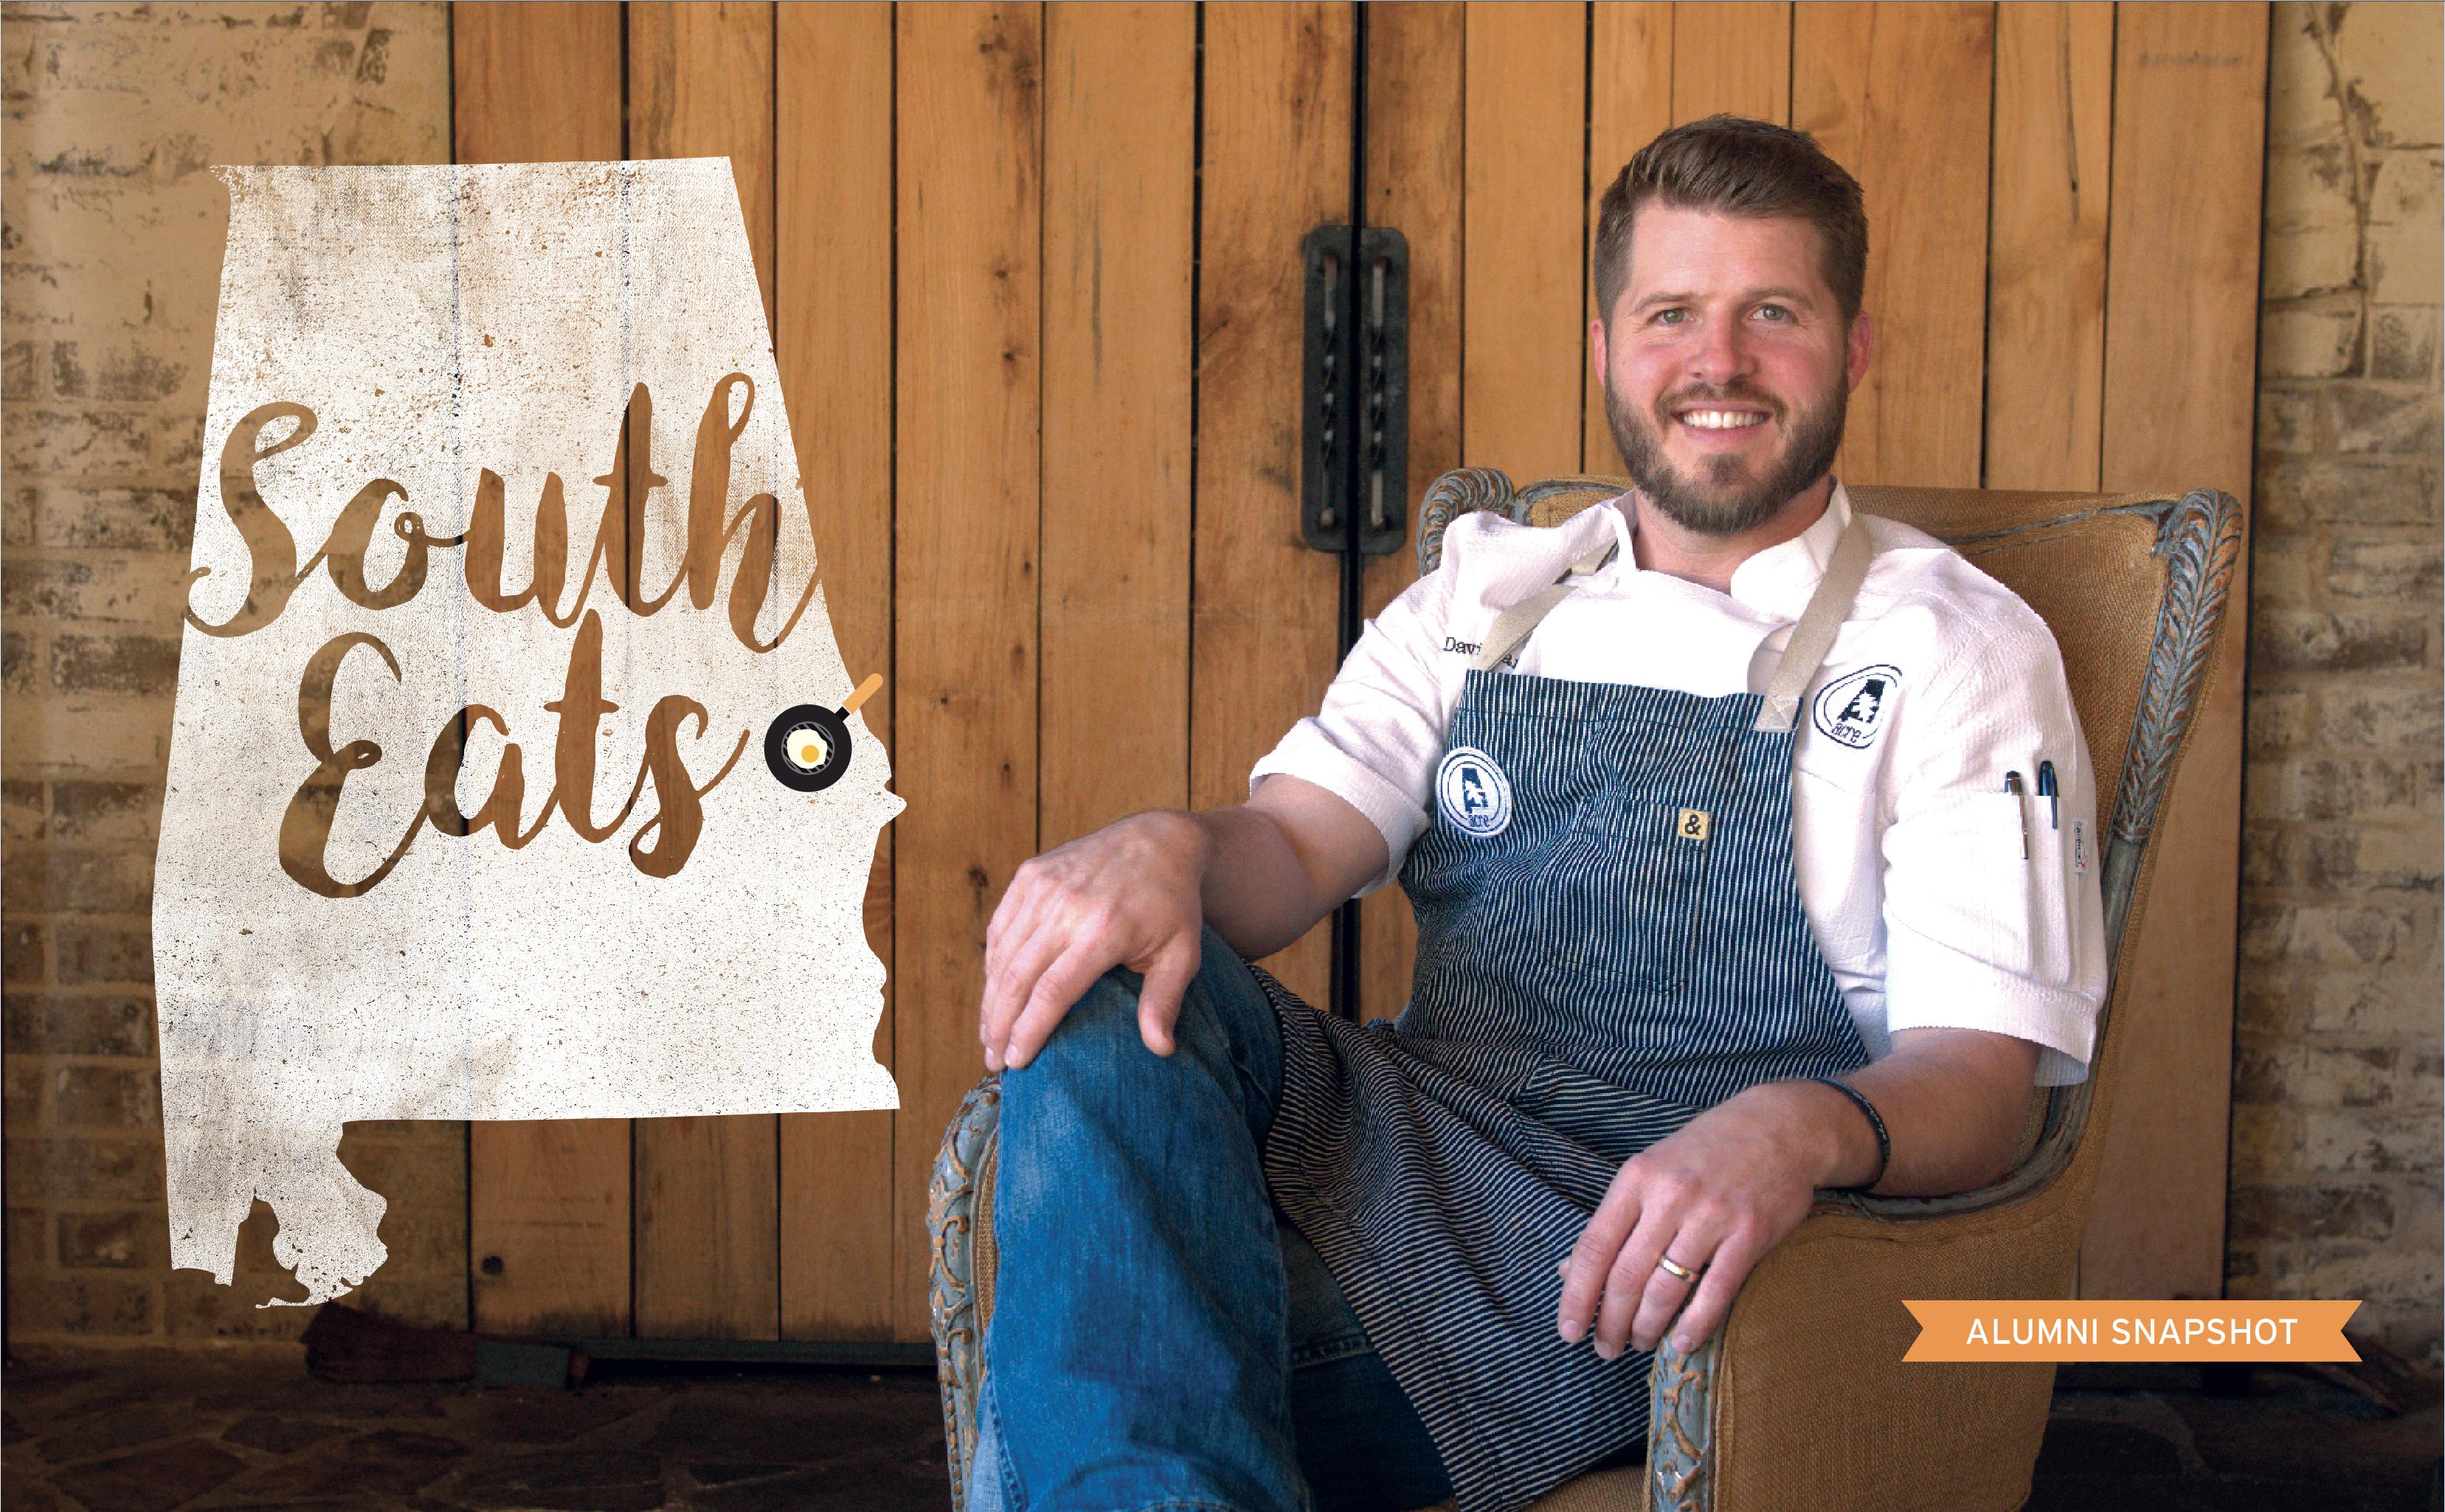 South Eats, David Bancroft